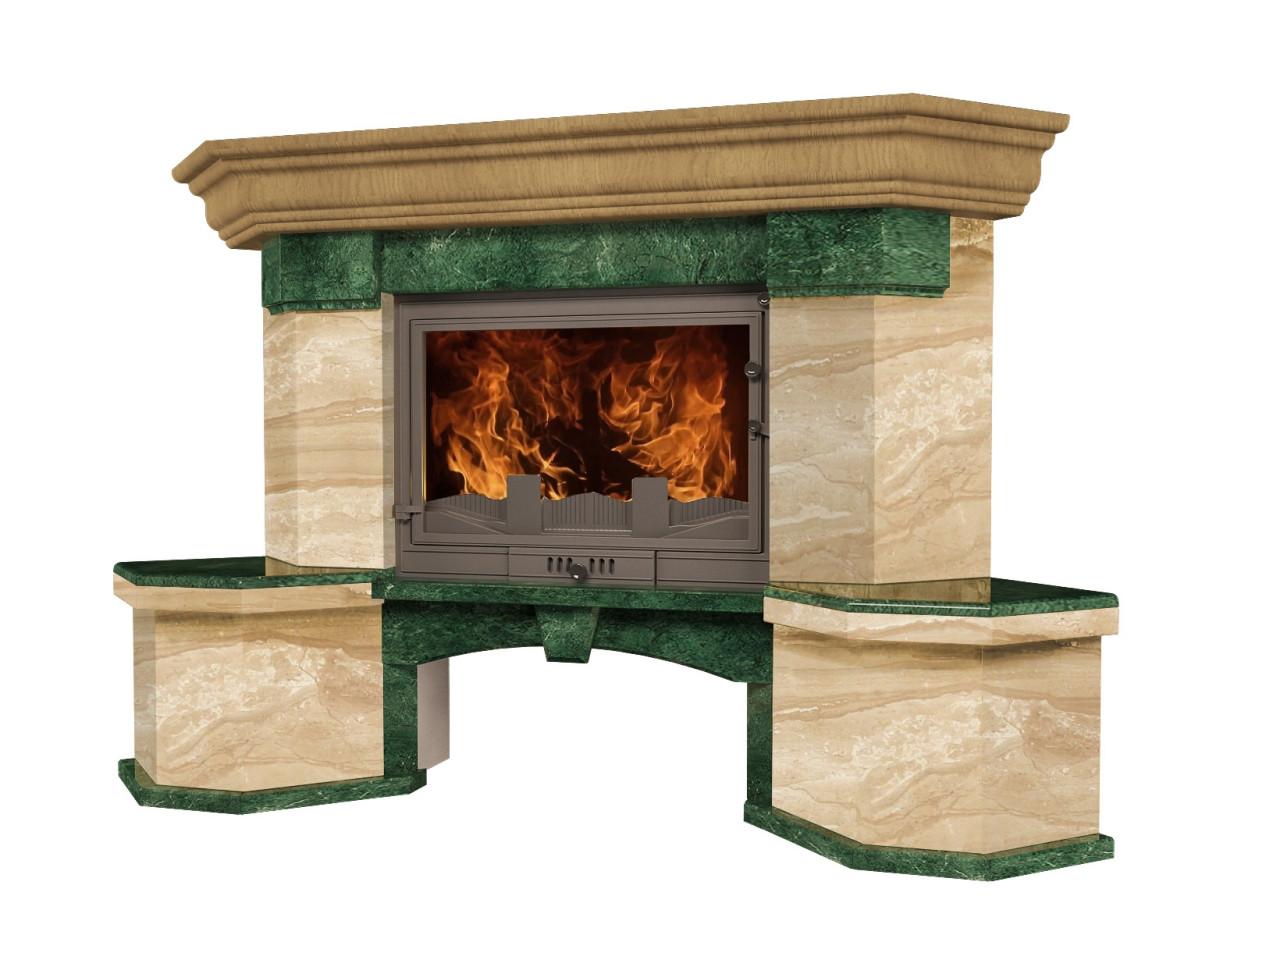 Портал для камина (облицовка) Флоренция из натурального мрамора Verde Guatemala, Daino Reale